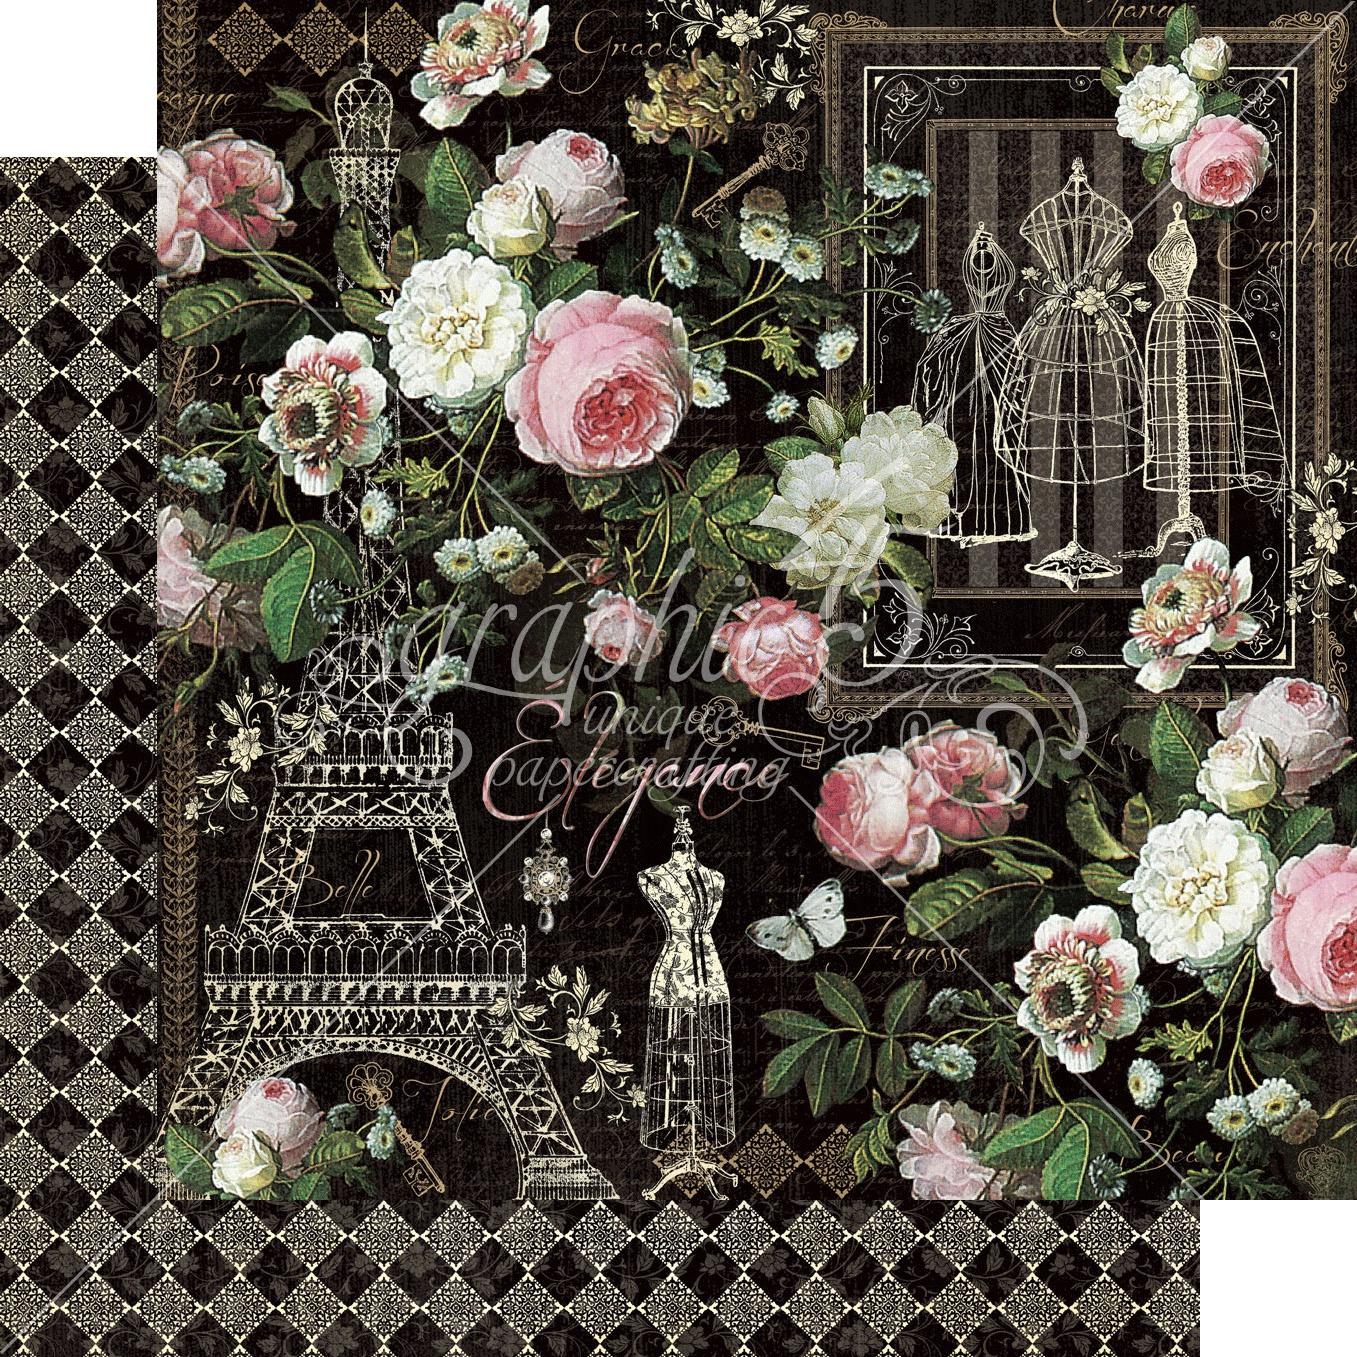 Elegance Double-Sided Cardstock - Elegance 12x12